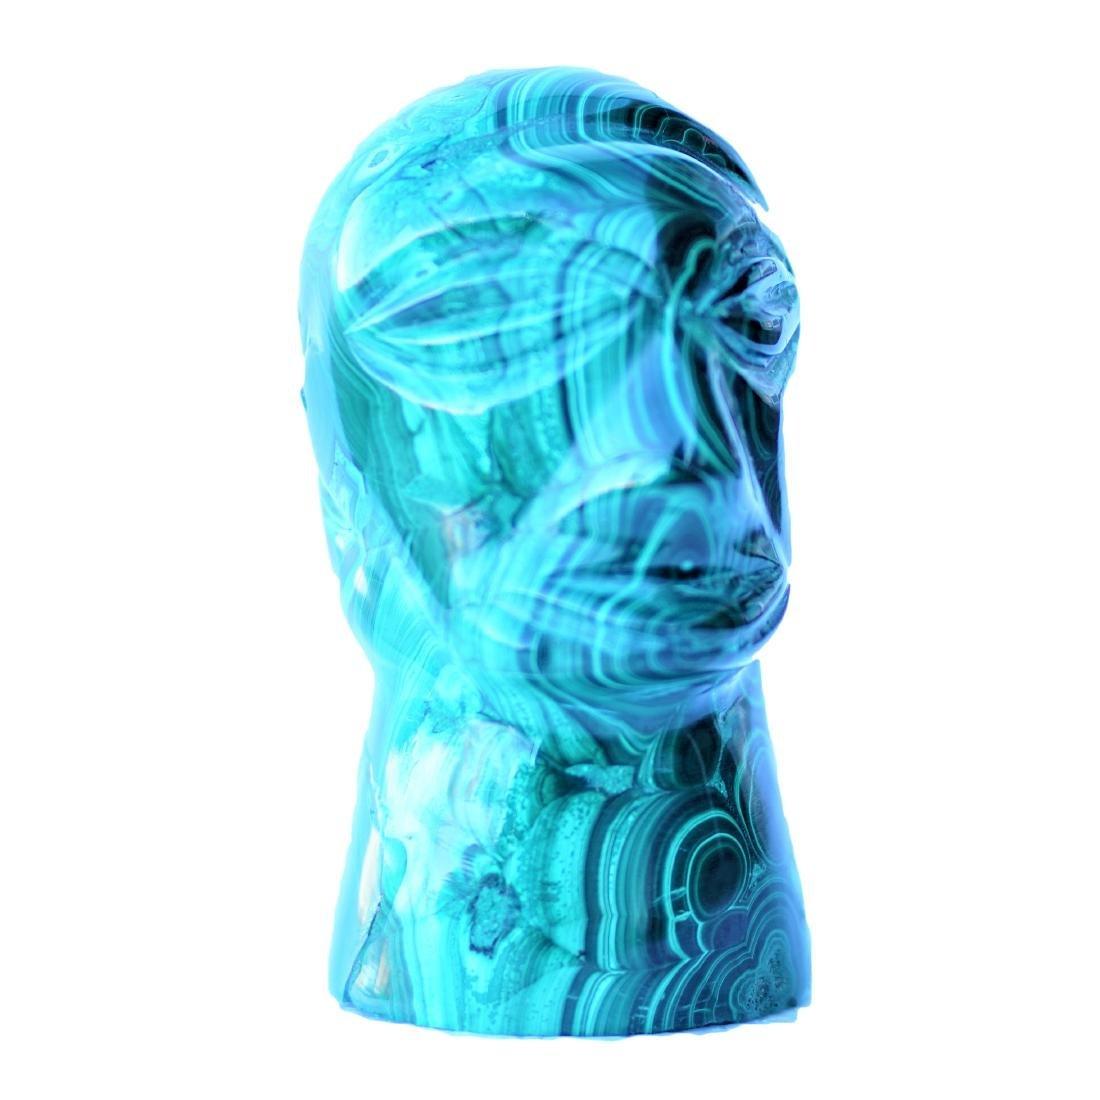 "Carved Malachite Figure 4.5"" Tall"